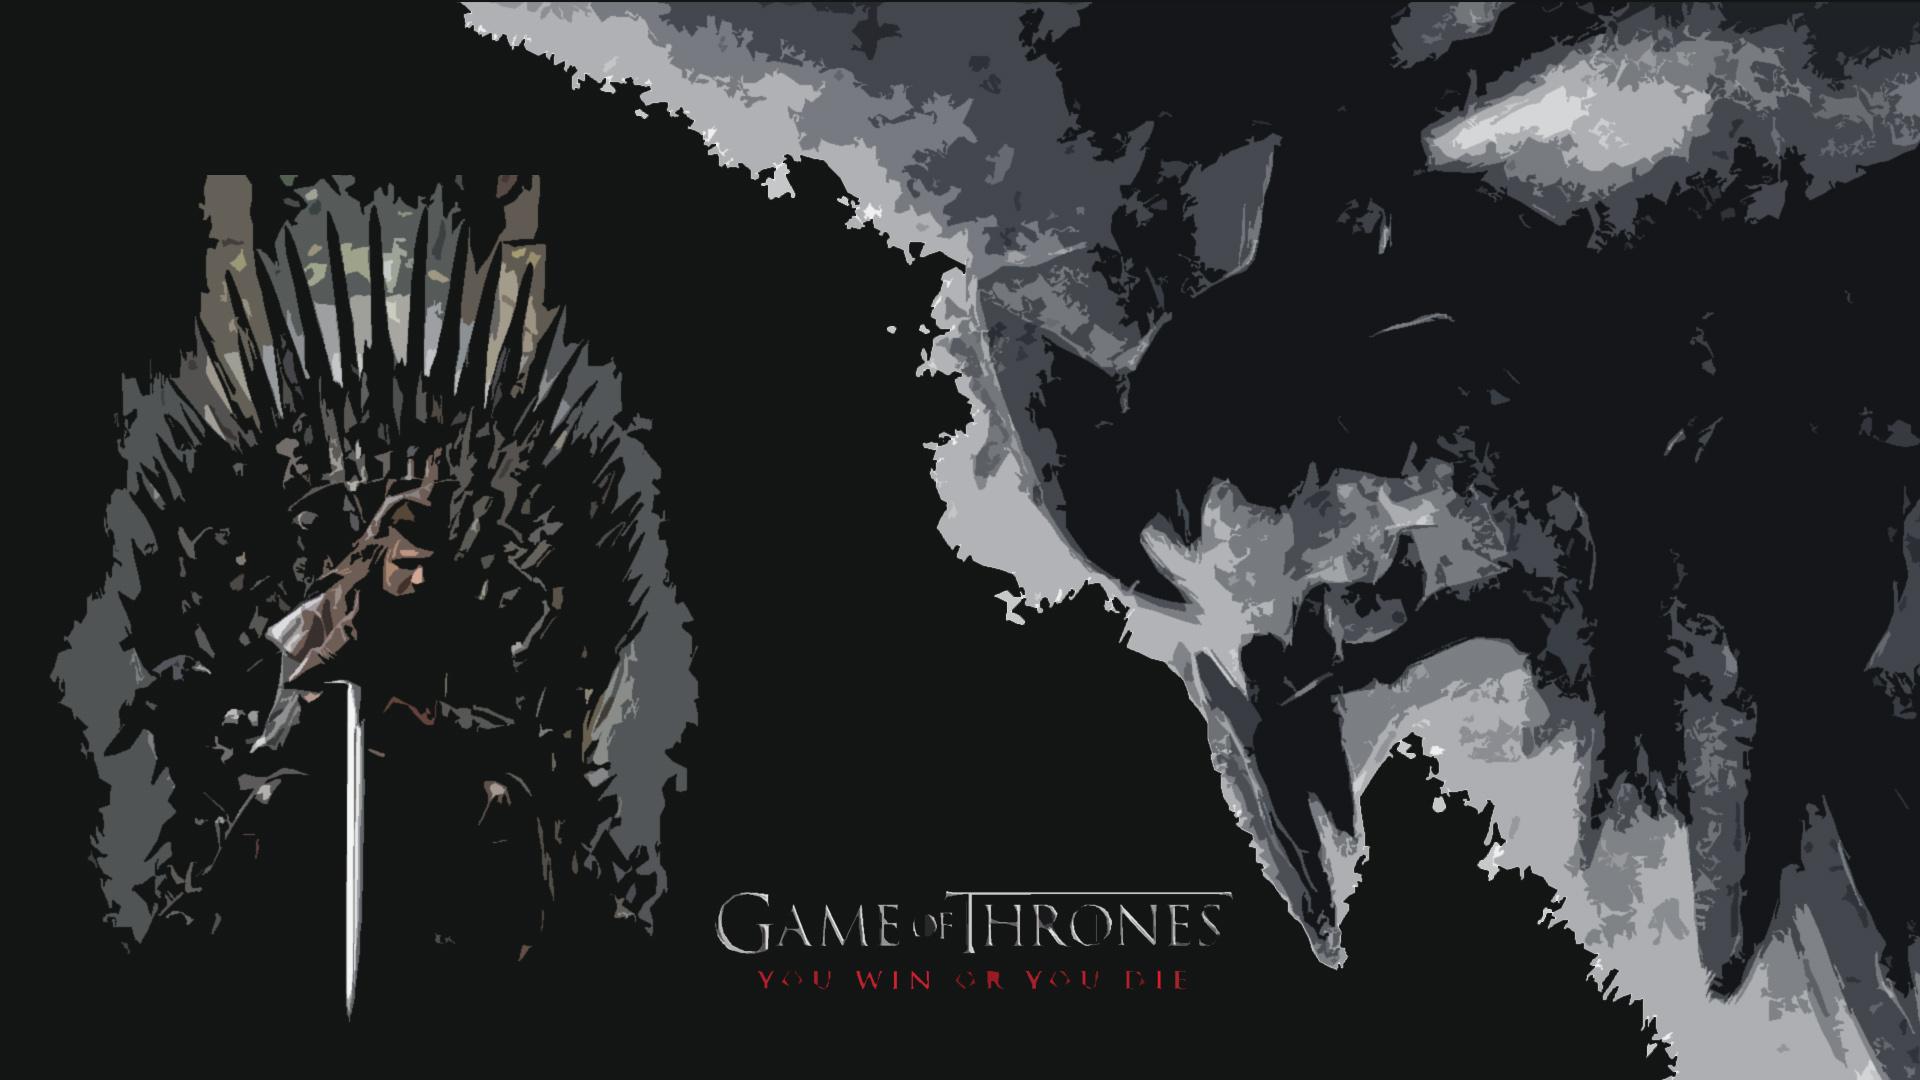 game of thrones art wallpaper - photo #21